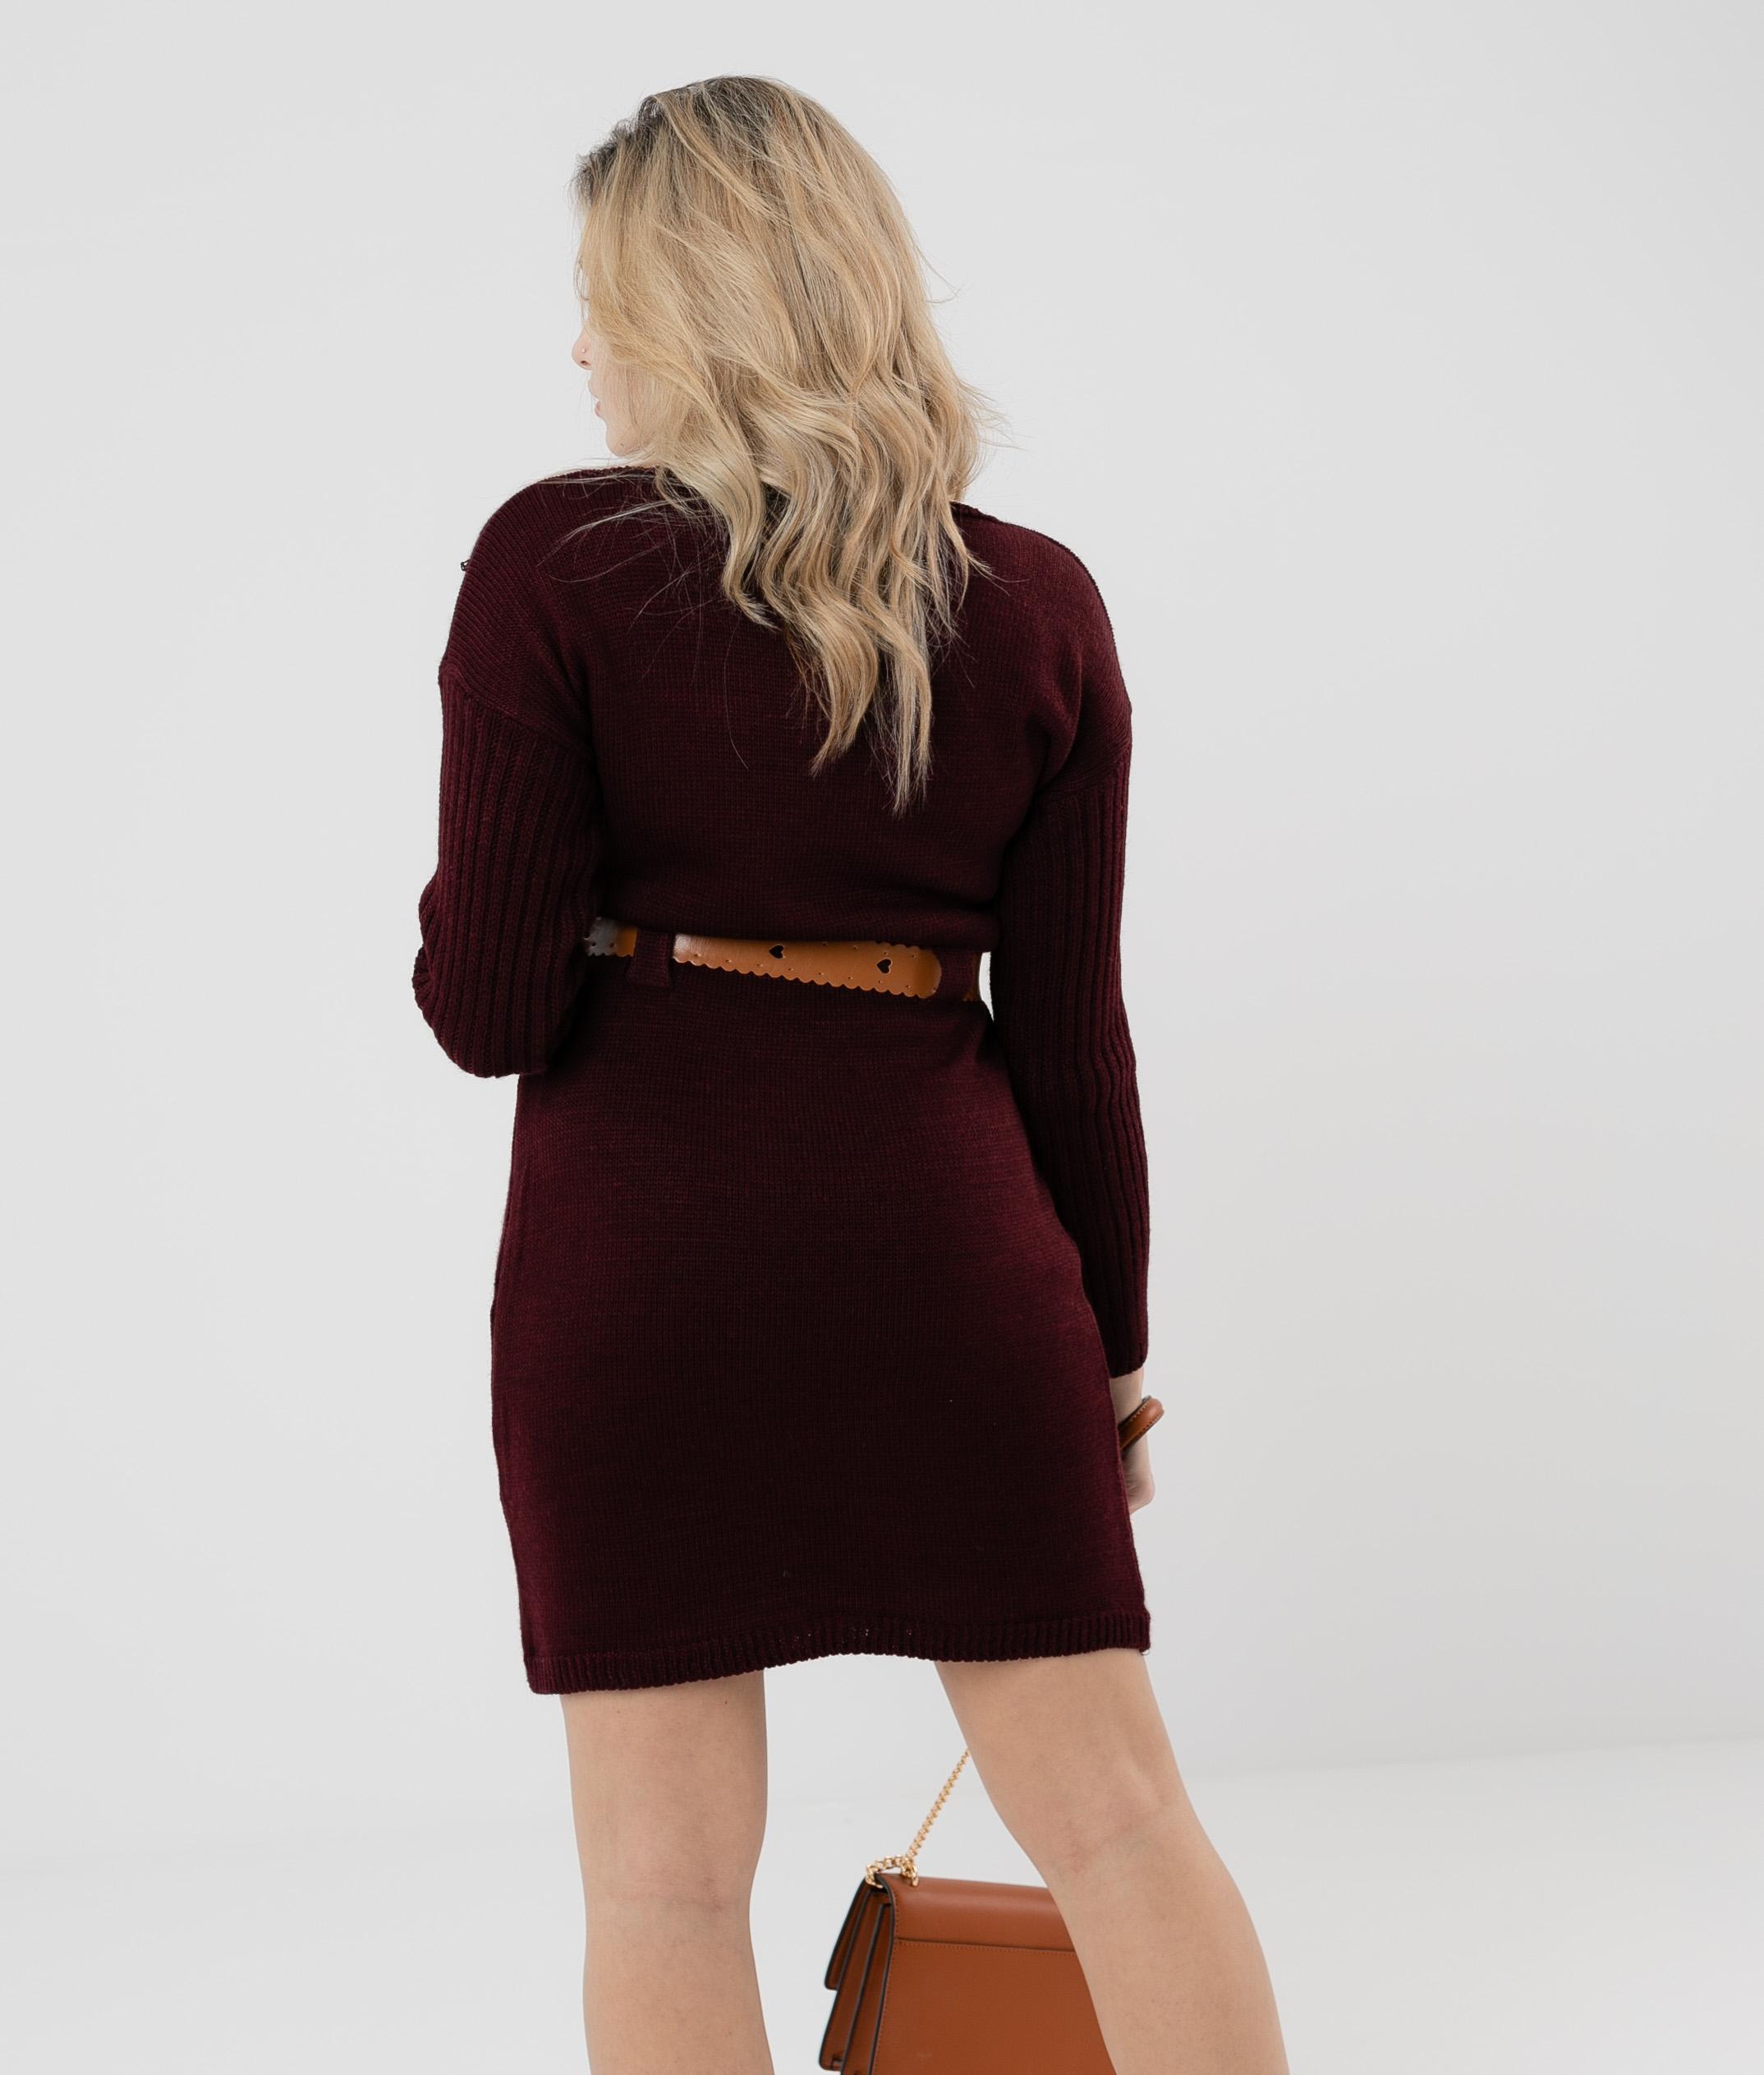 DRESS BUBI - MAROON